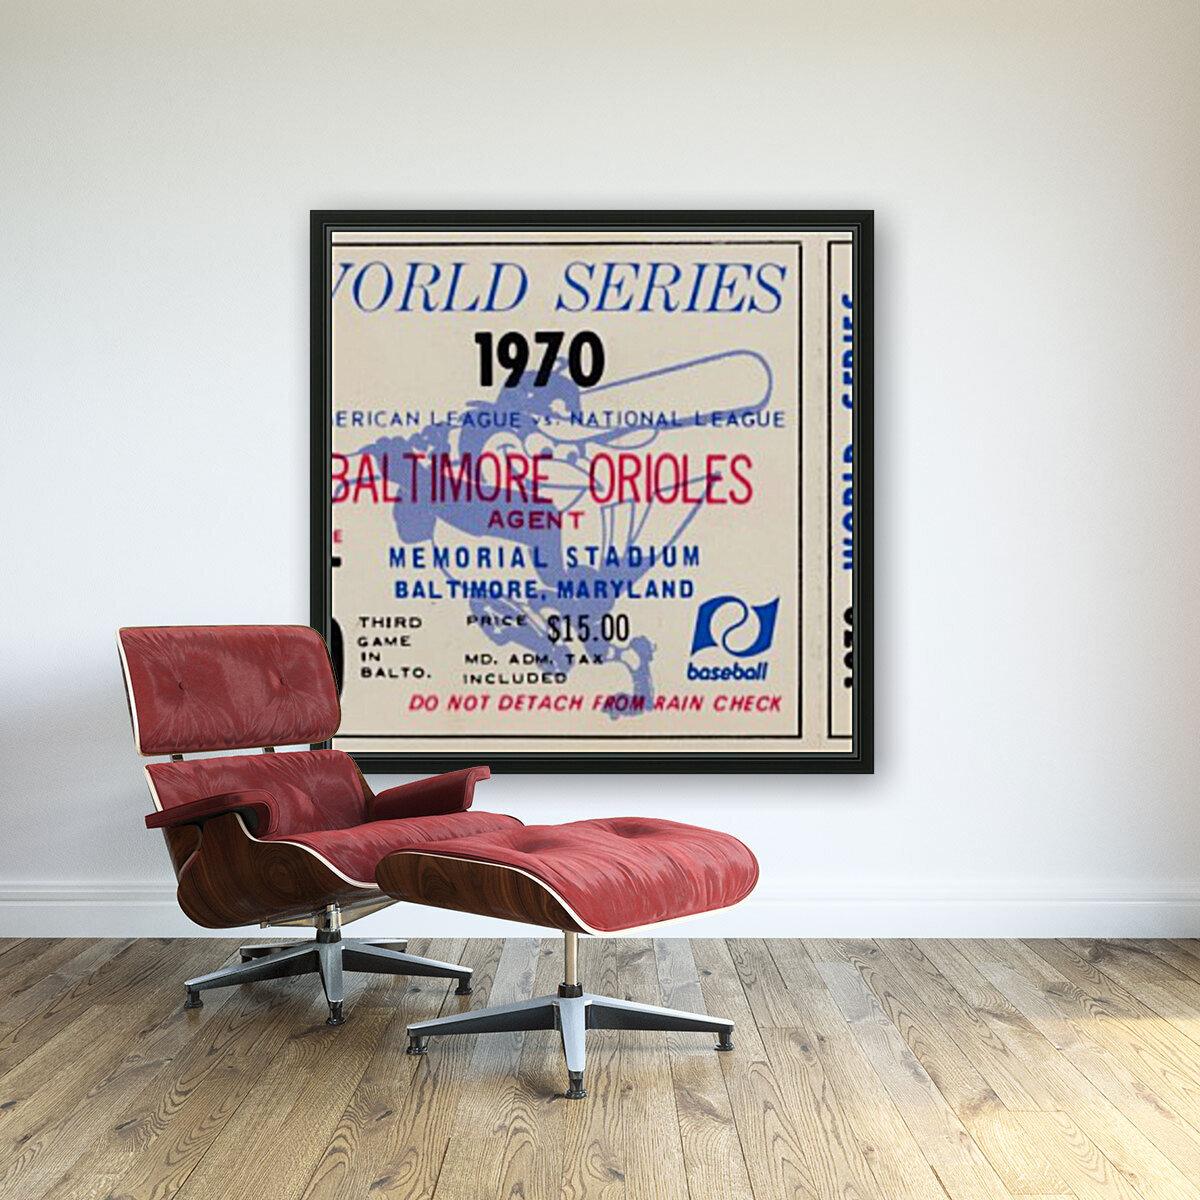 1970_Major League Baseball_World Series_Baltimore Orioles vs. Cincinnati Reds_Memorial Stadium_Row 1  Art